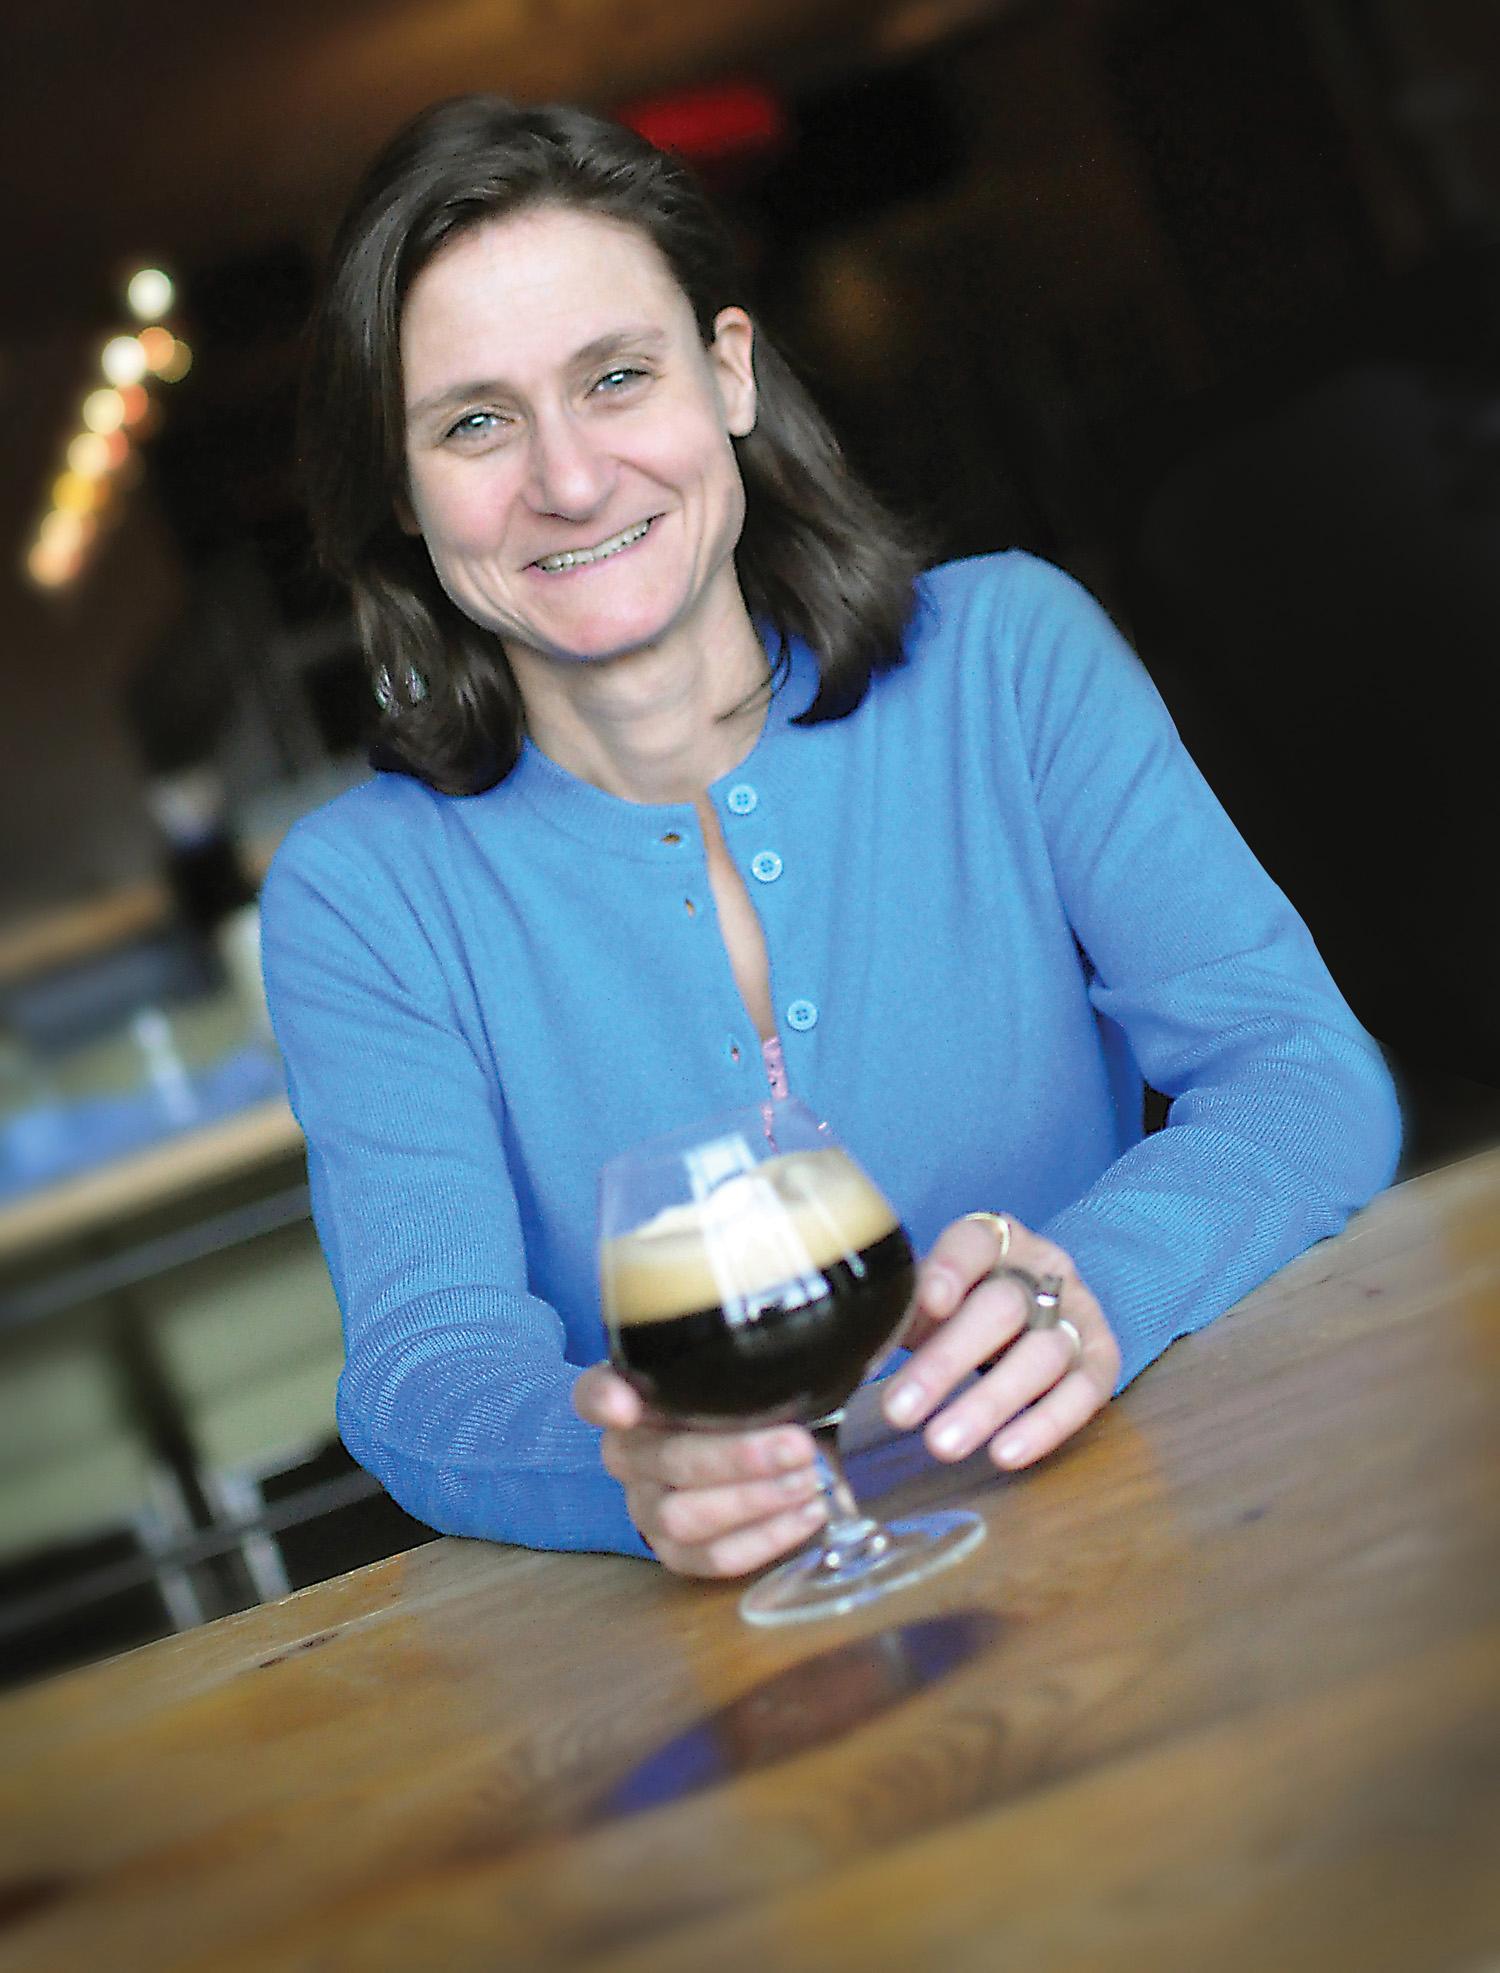 Julia Herz from the Brewers Association